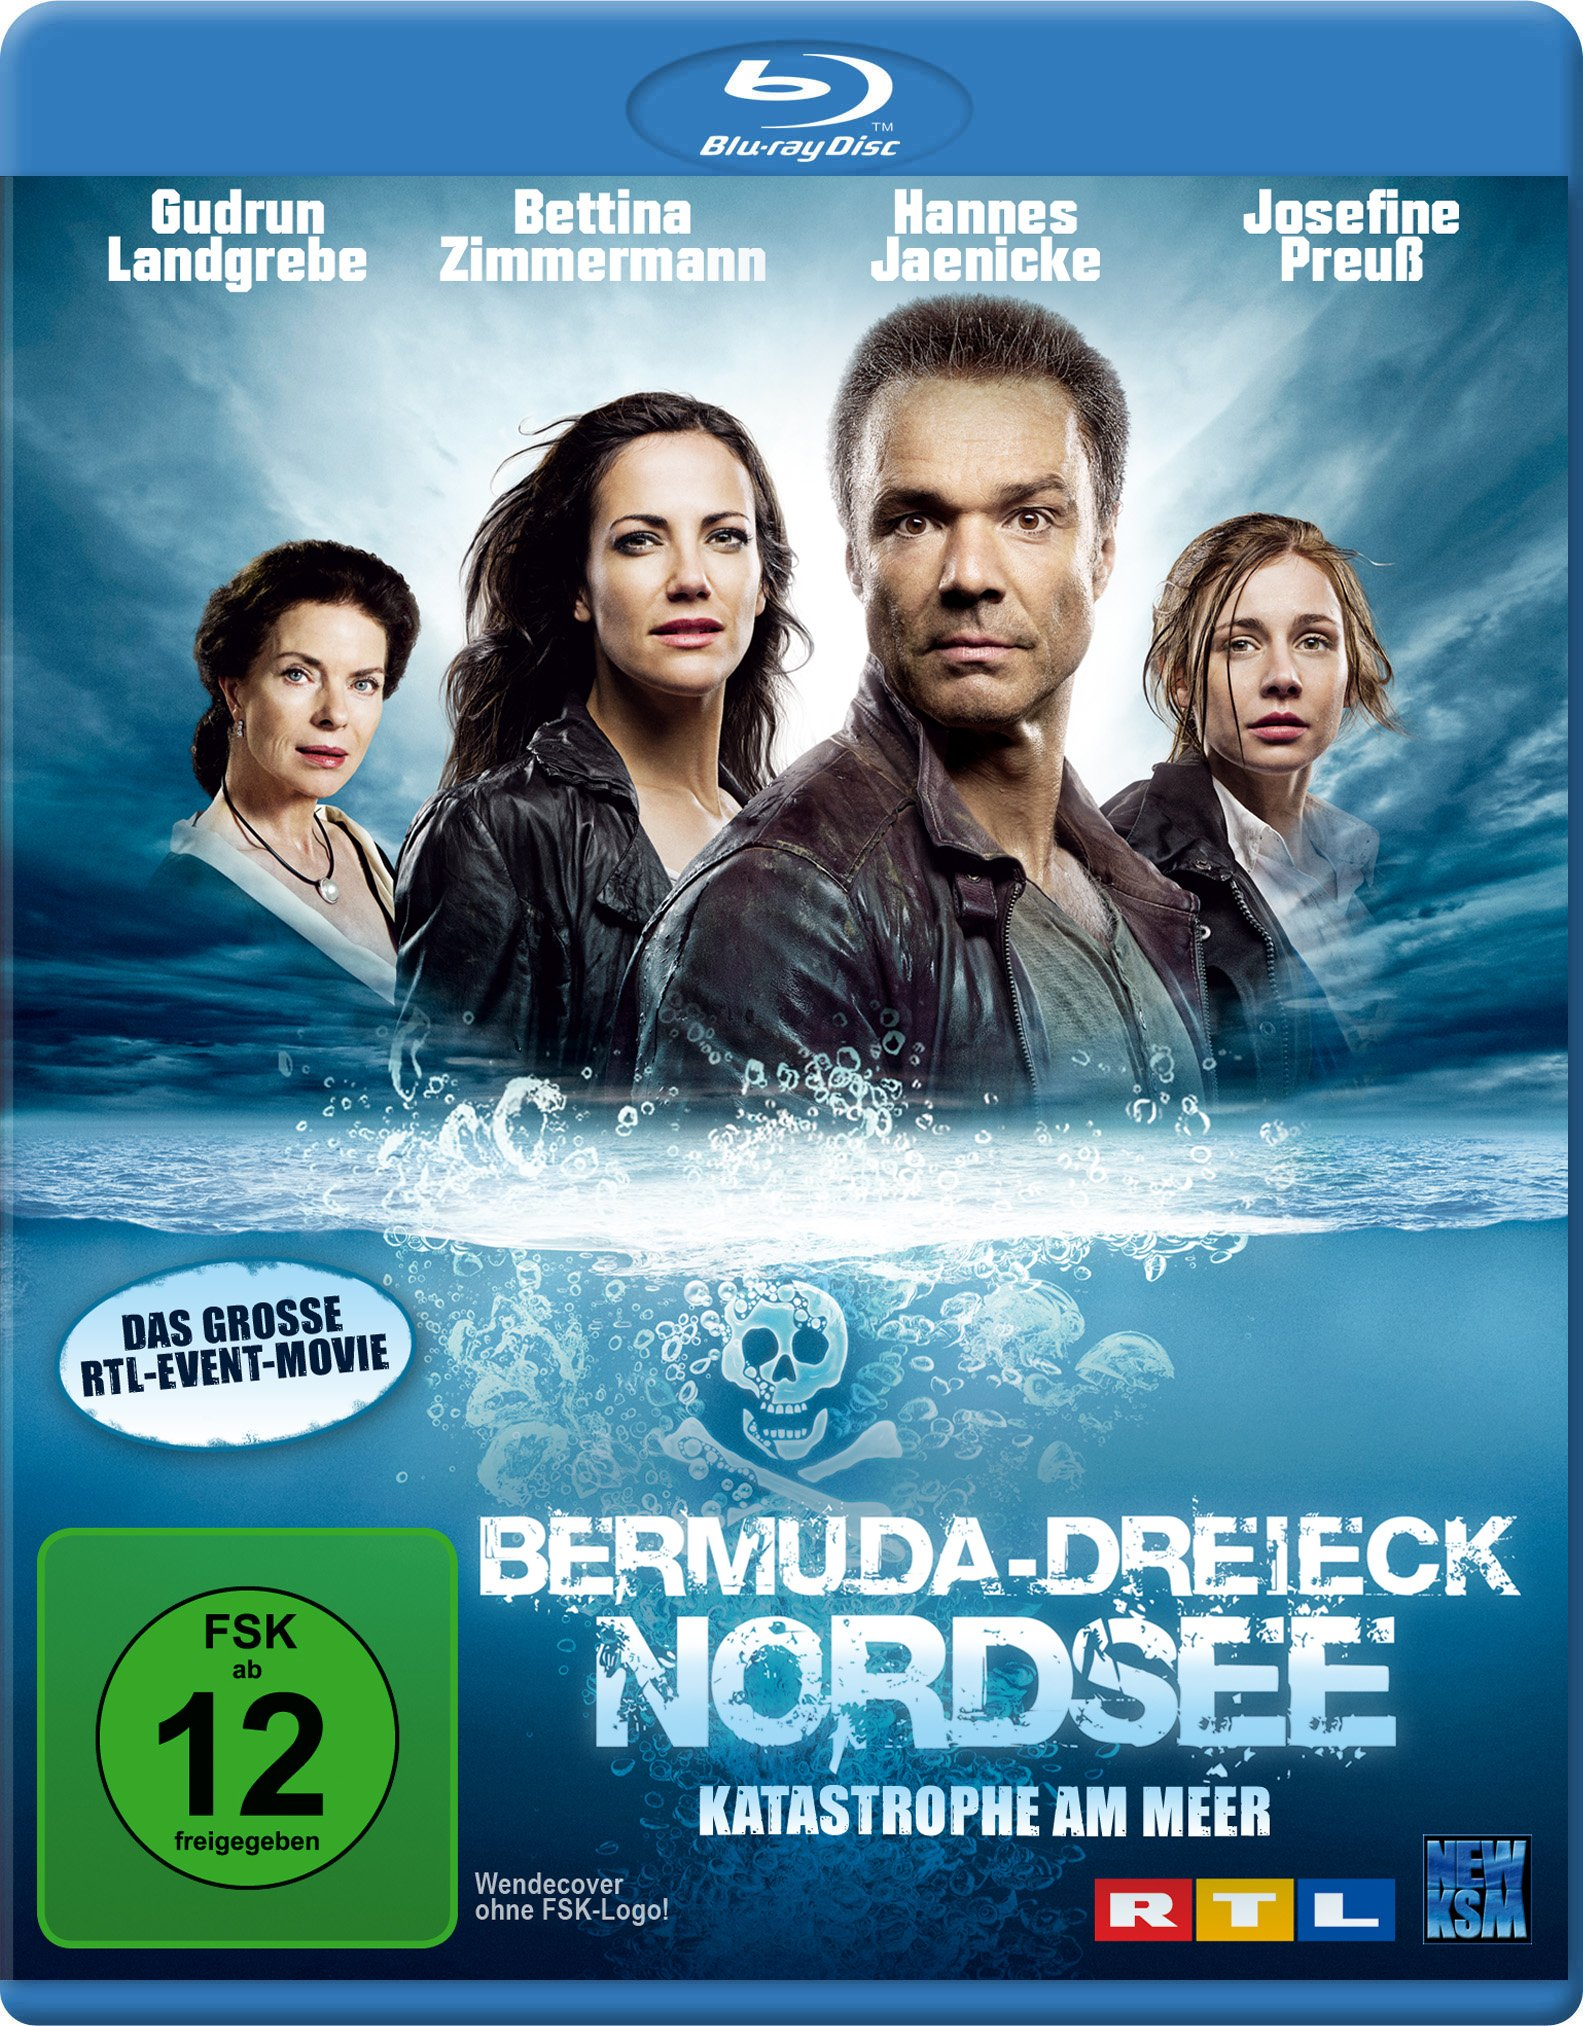 Bermuda.Dreieck.Nordsee.2011.German.1080p.BluRay.AVC-ARMO